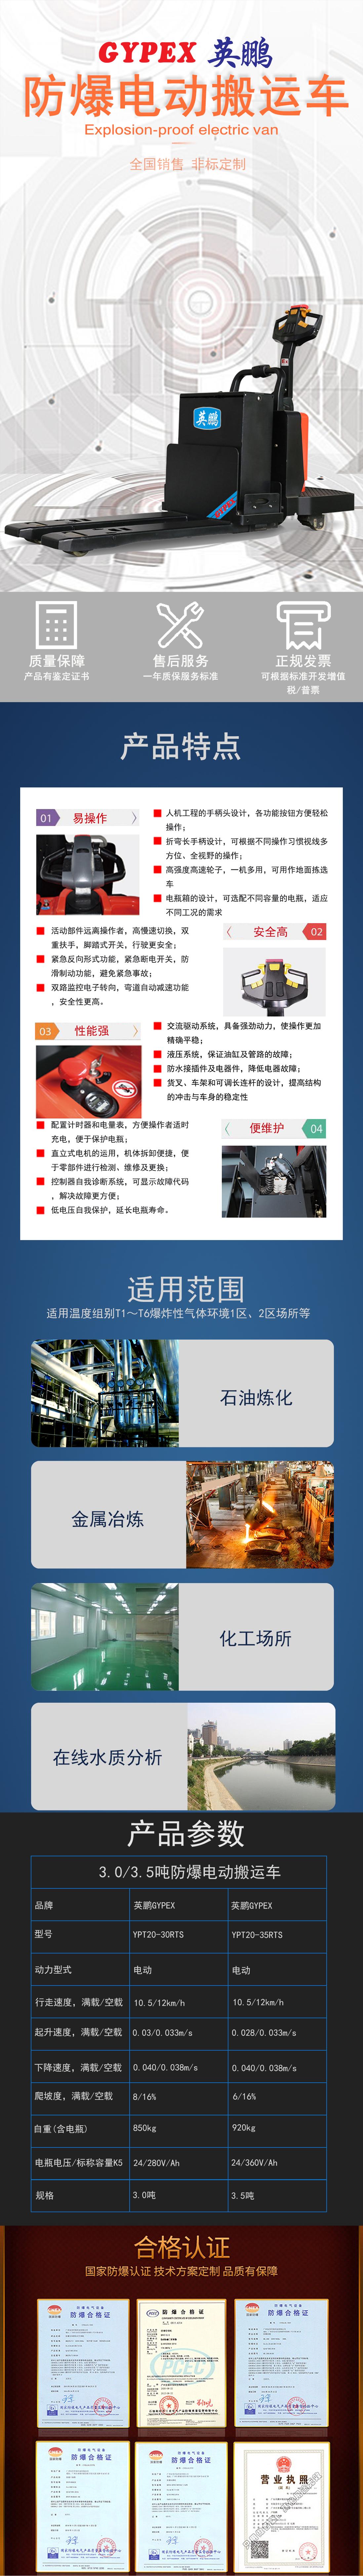 YPT20-30RTS 35RTSi電動搬運車詳情圖.jpg